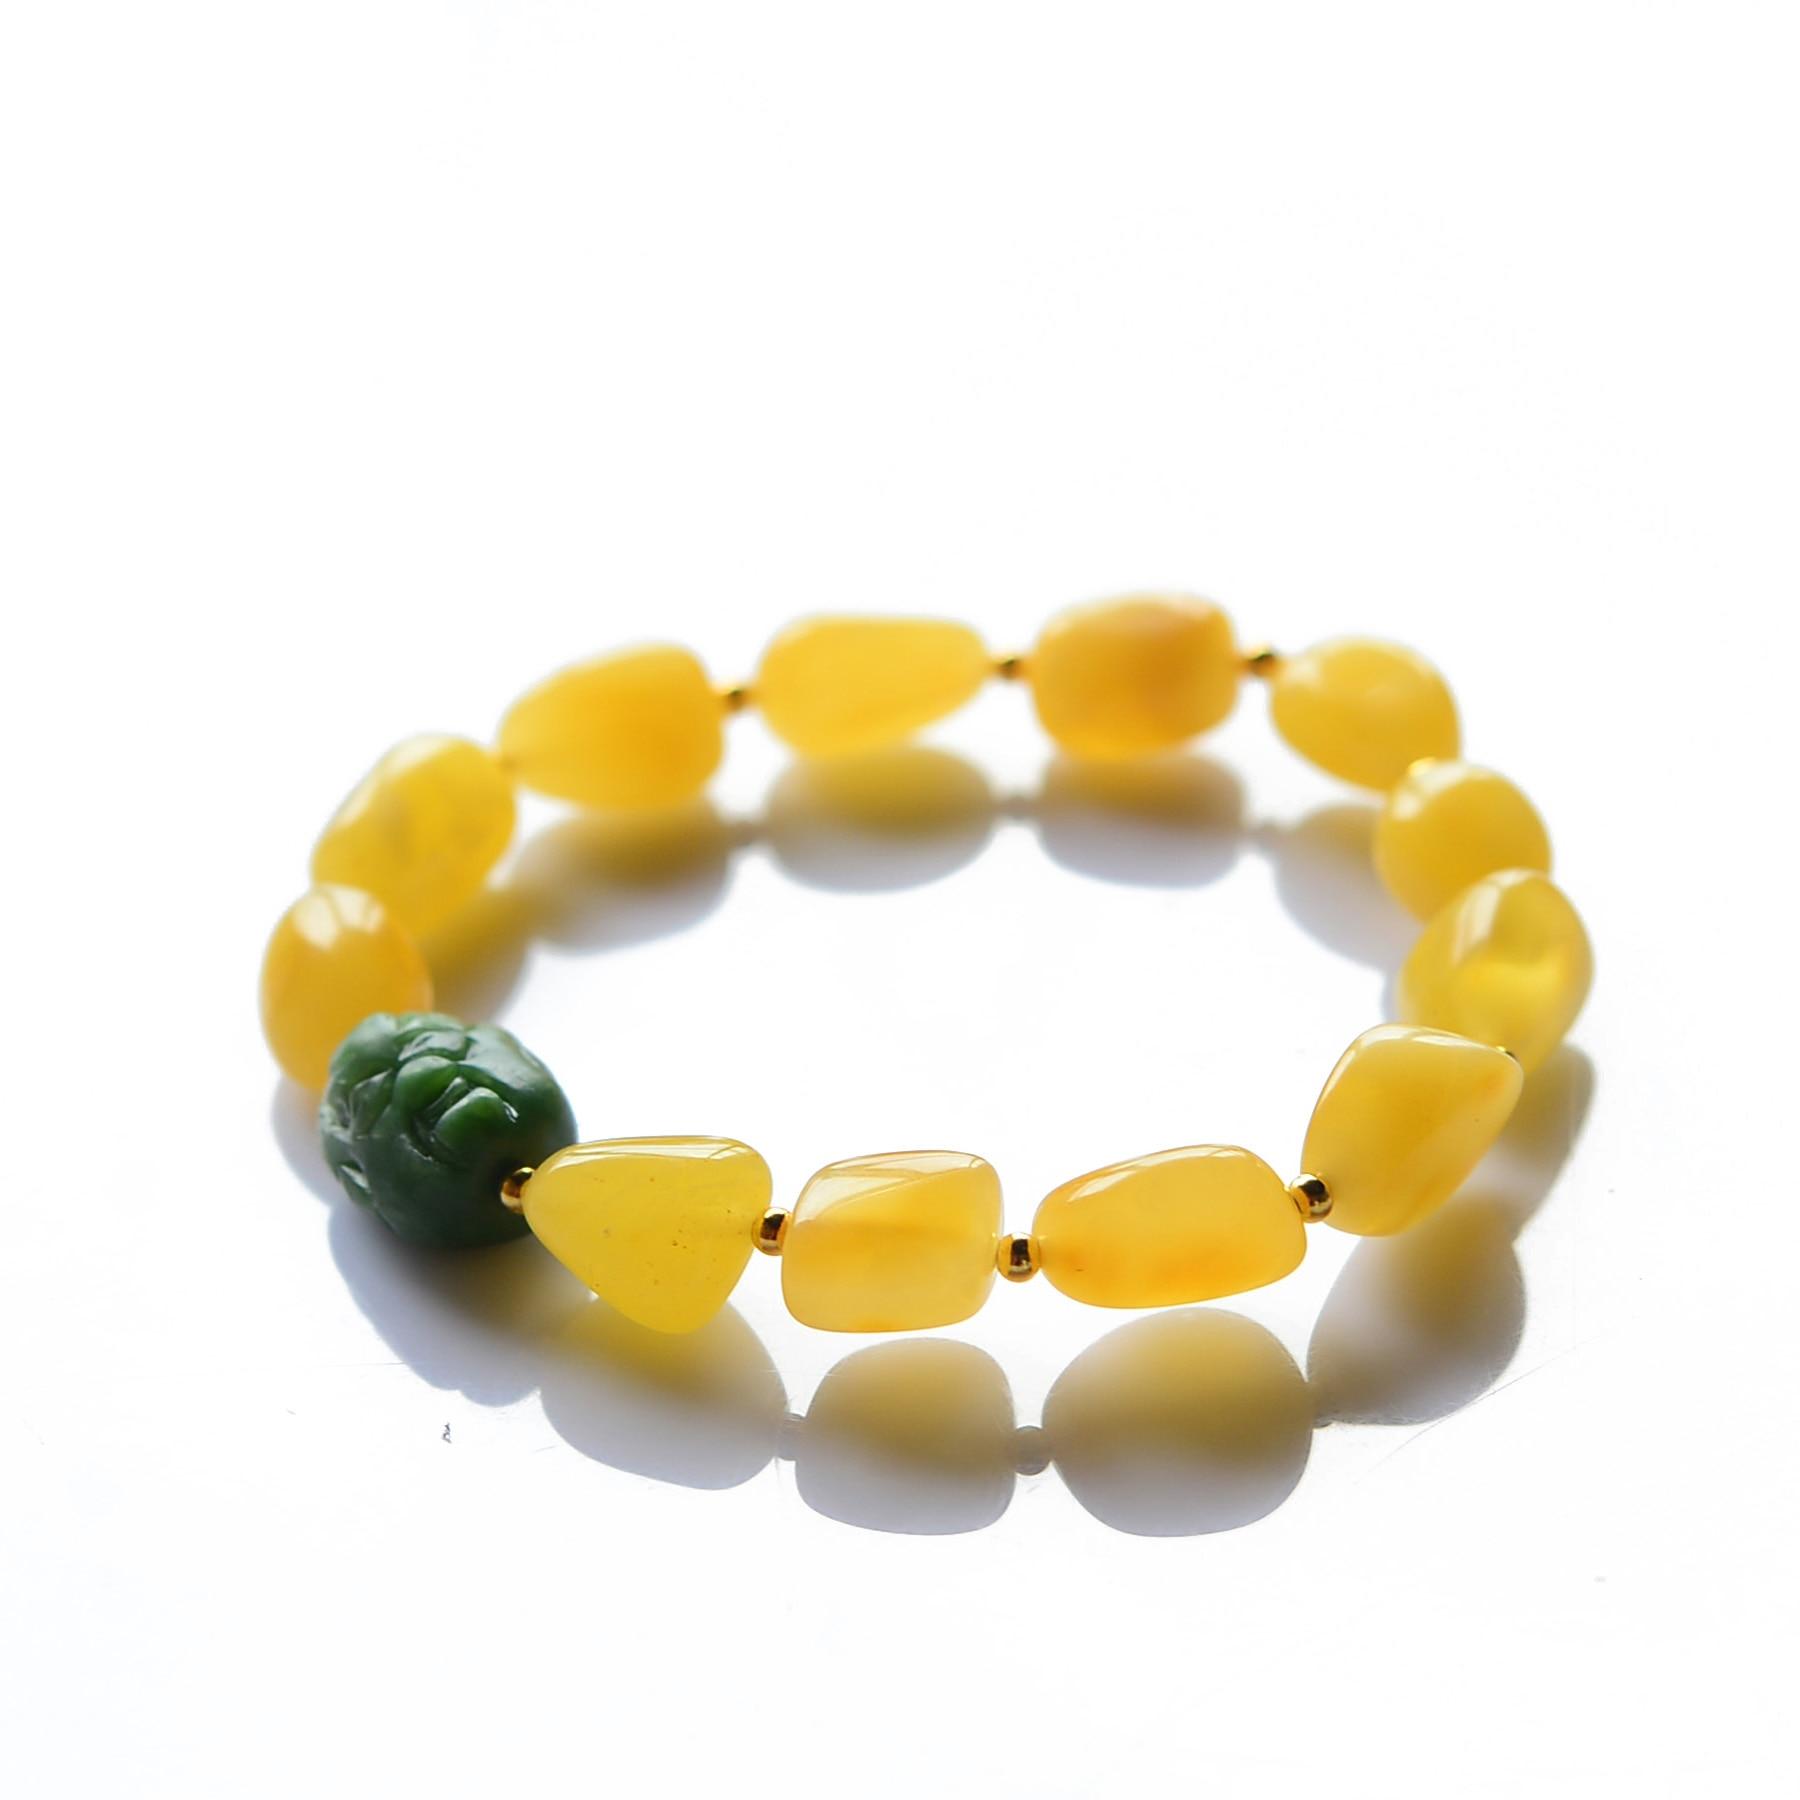 Handmade Authentic Wax Crystal Beads Bracelets handmade authentic wax crystal bracelets